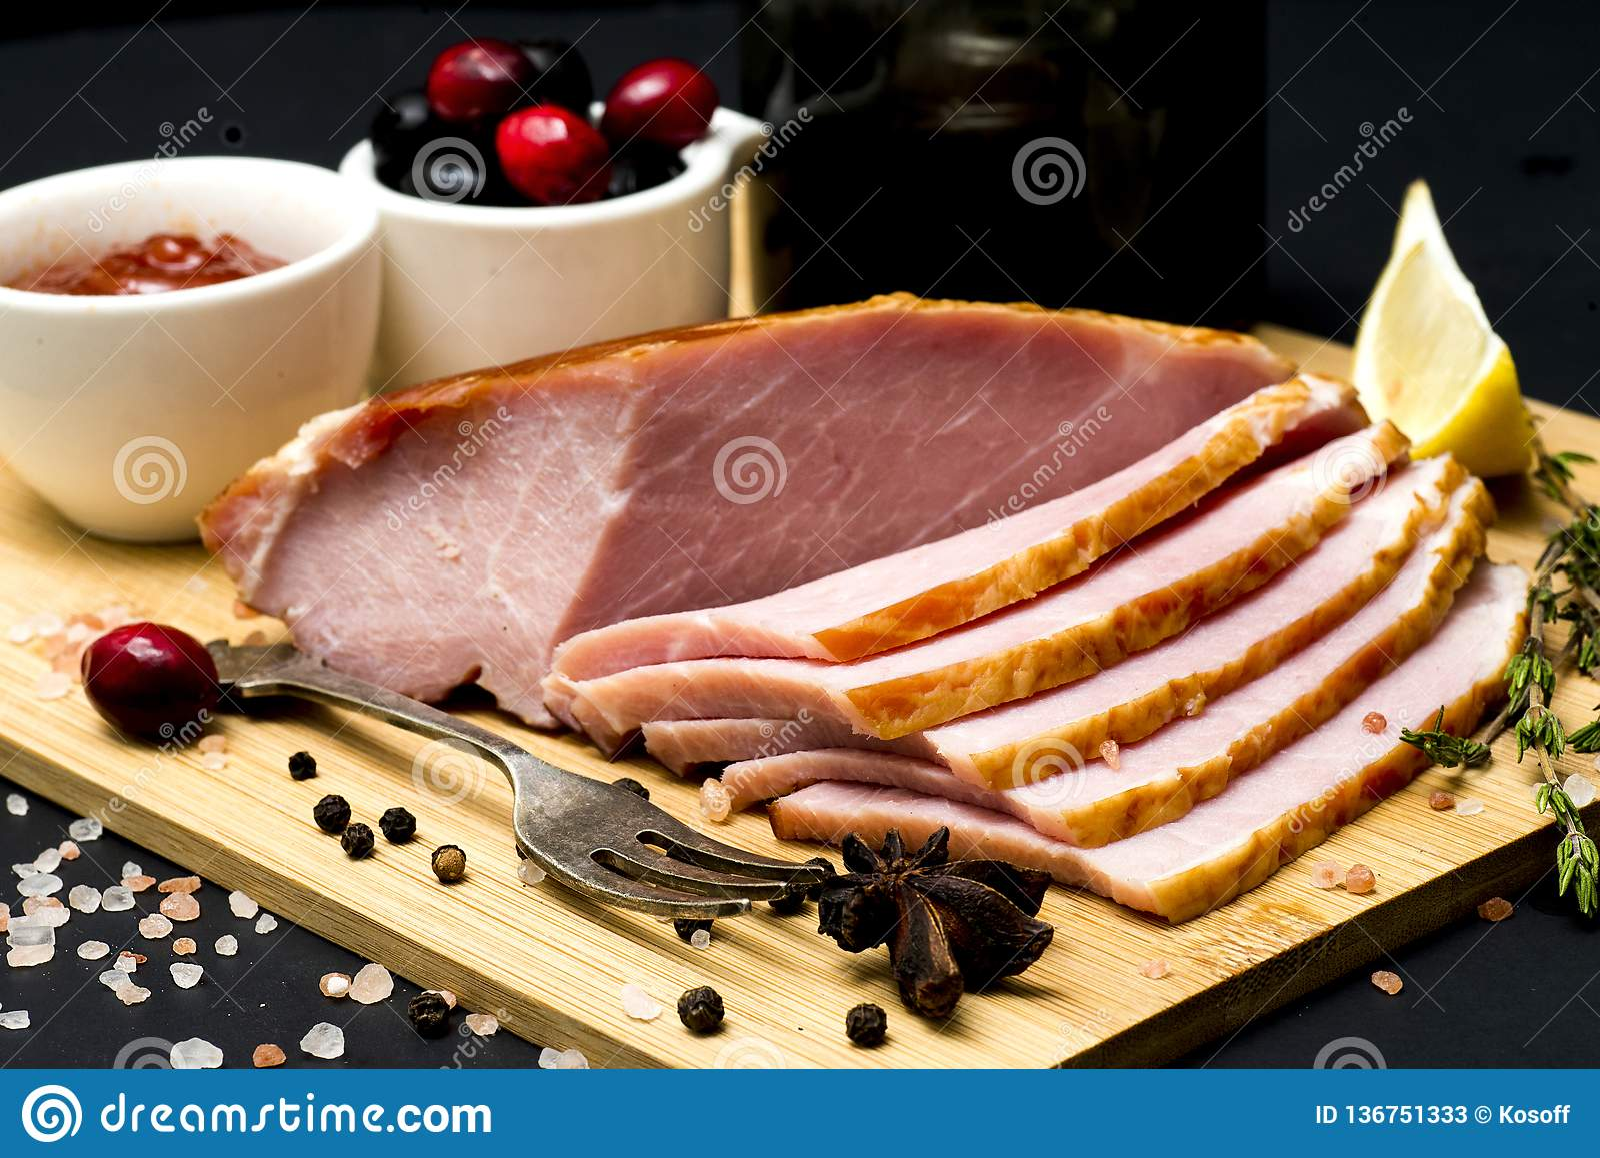 Bife da carne de porco, faixa do carbonato no fundo escuro